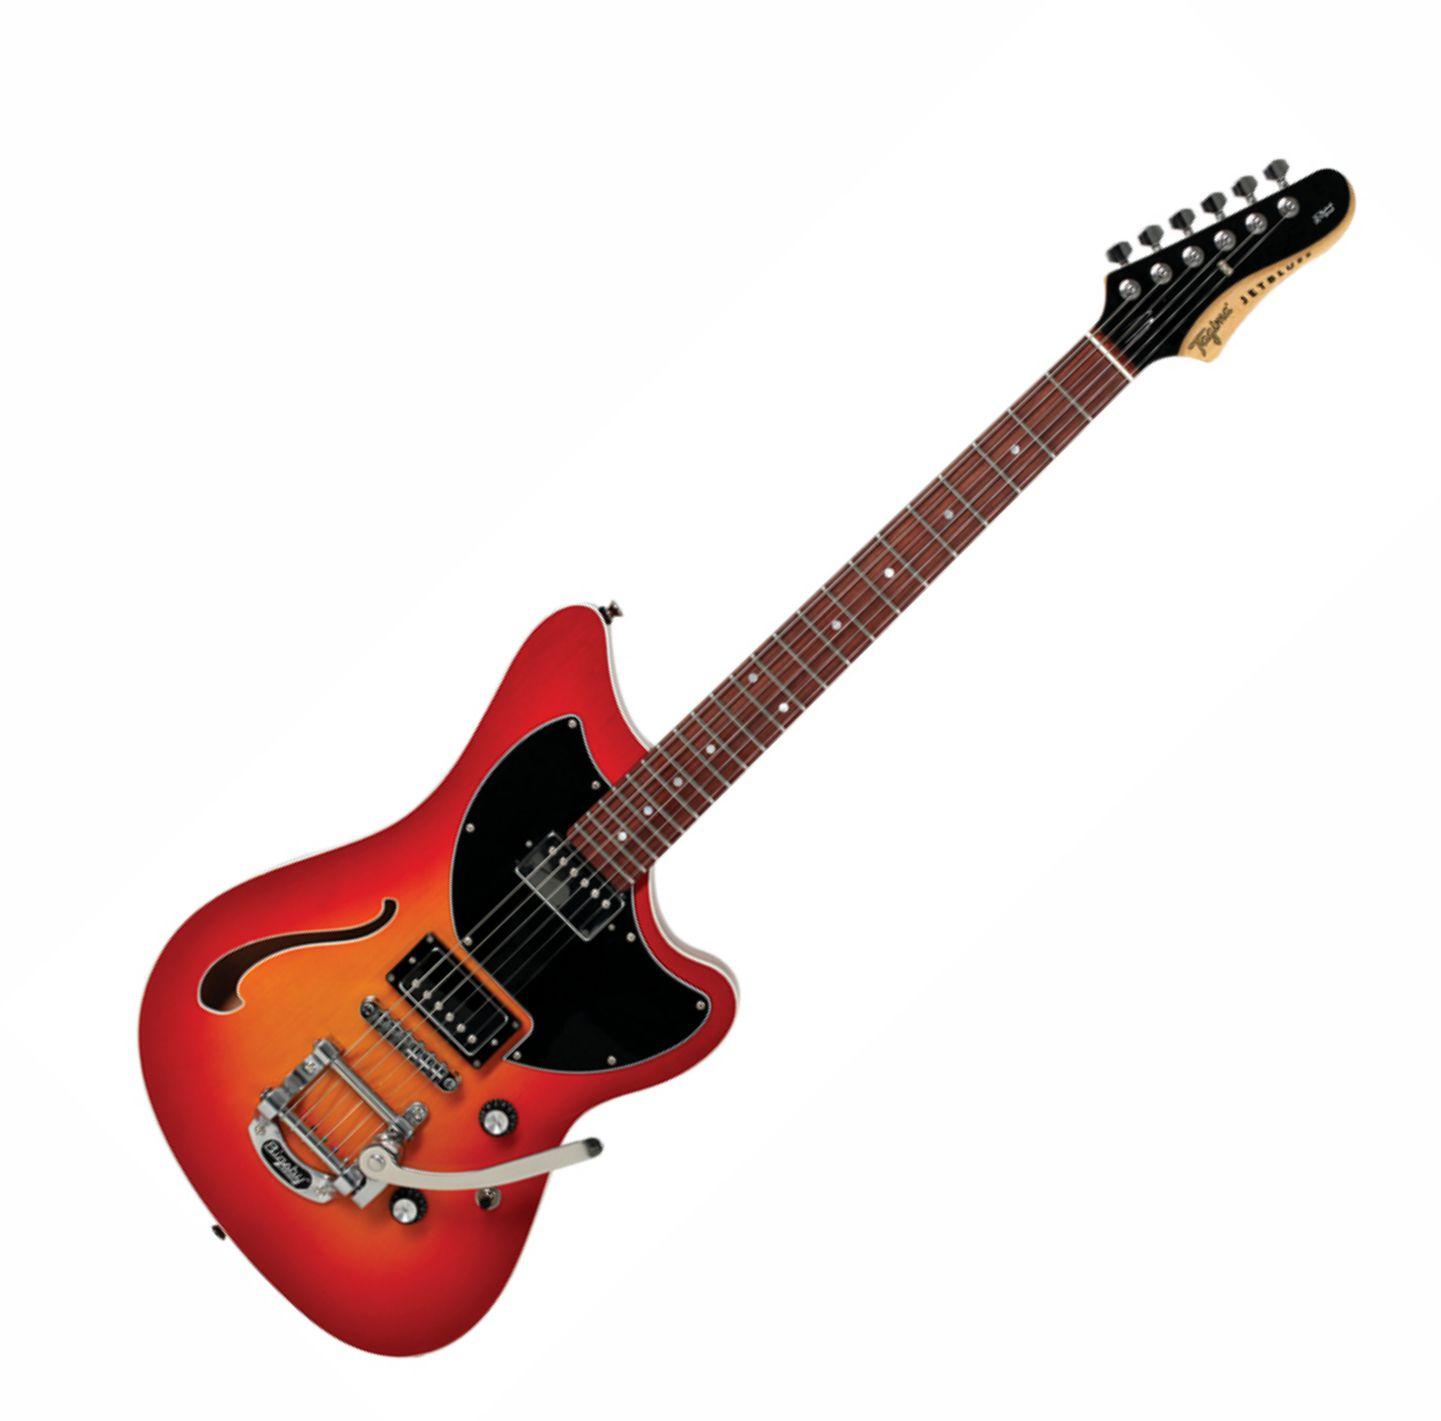 Guitarra Tagima Jet Blues Deluxe Handmade Brasil C/bigsby